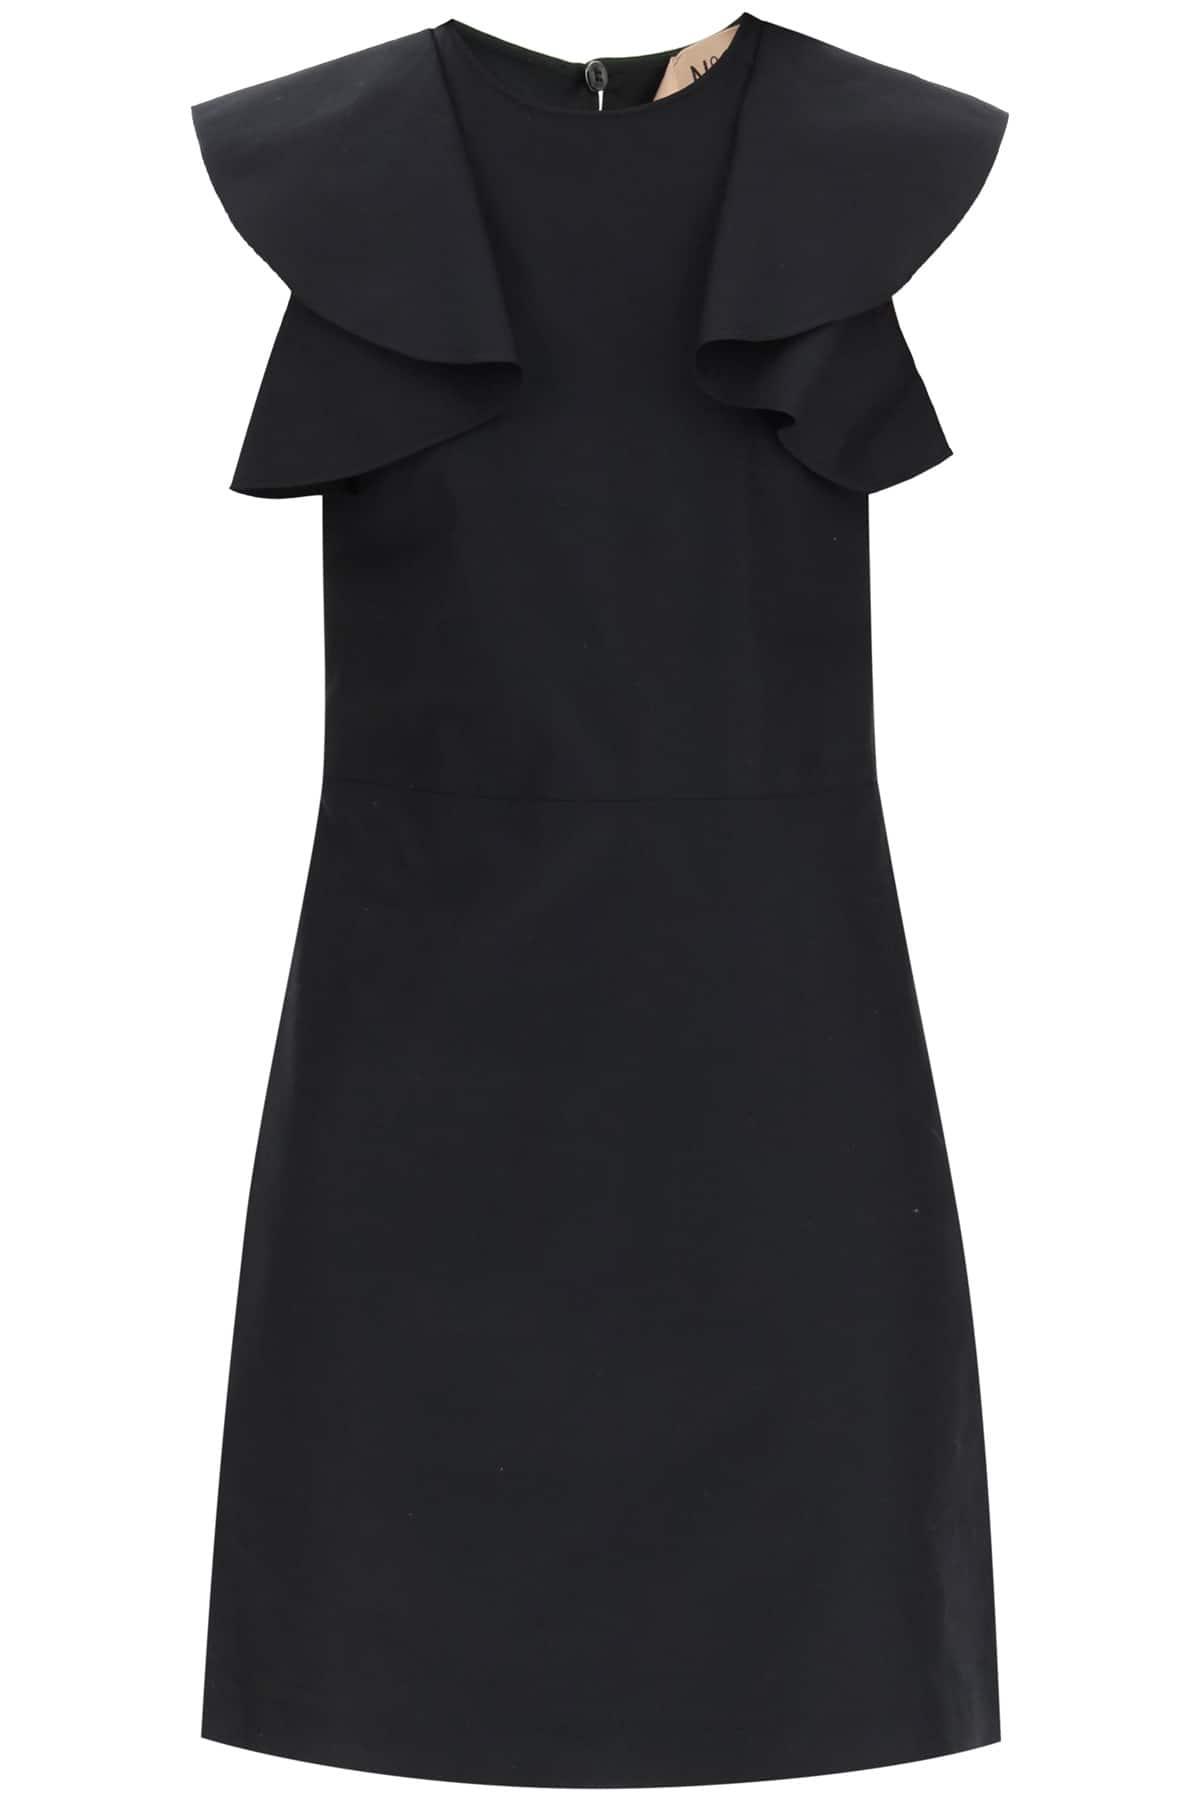 N.21 COTTON MINI DRESS WITH RUFFLES 38 Black Cotton